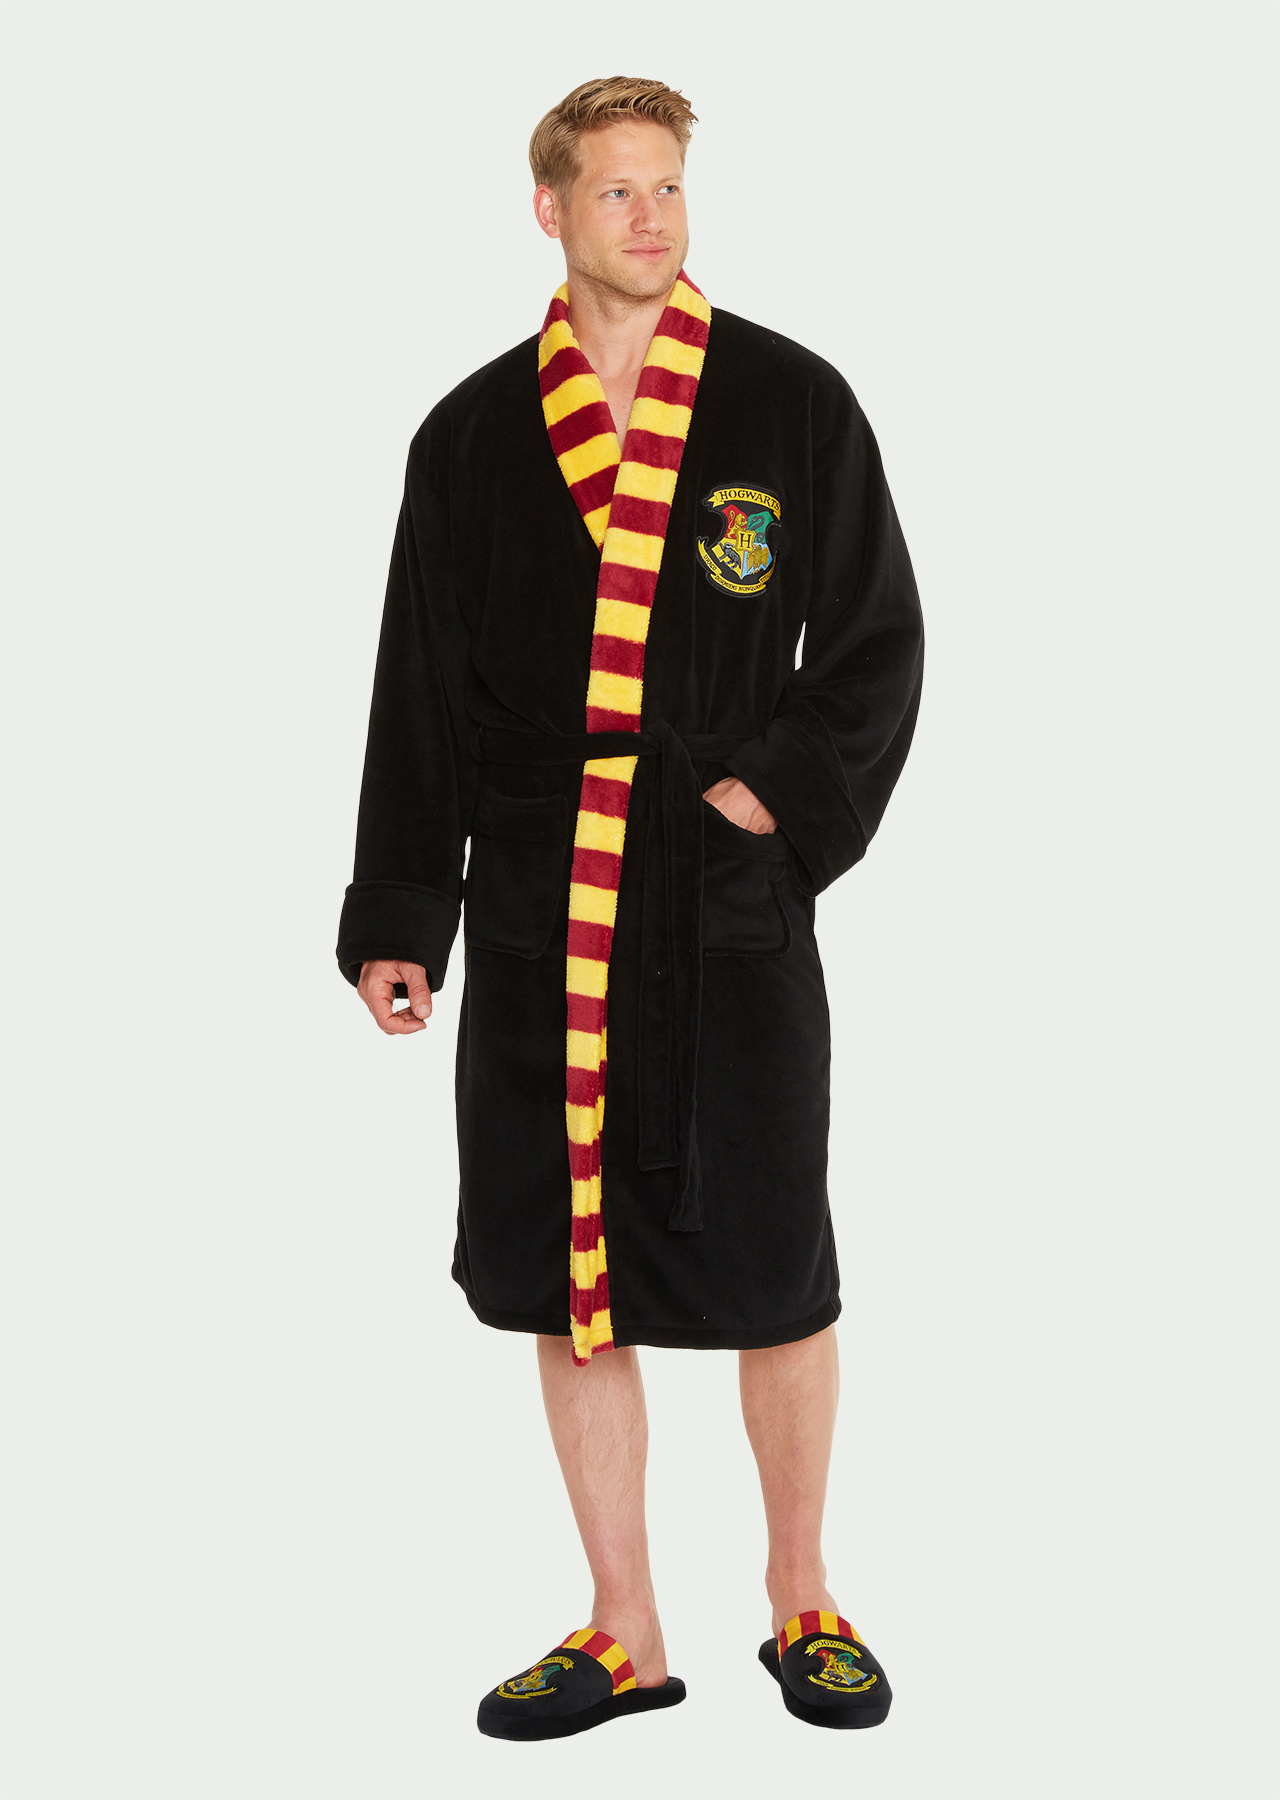 8ea20ed577 Hogwarts-Mens-Bathrobe front WEB.jpg. Tap to expand